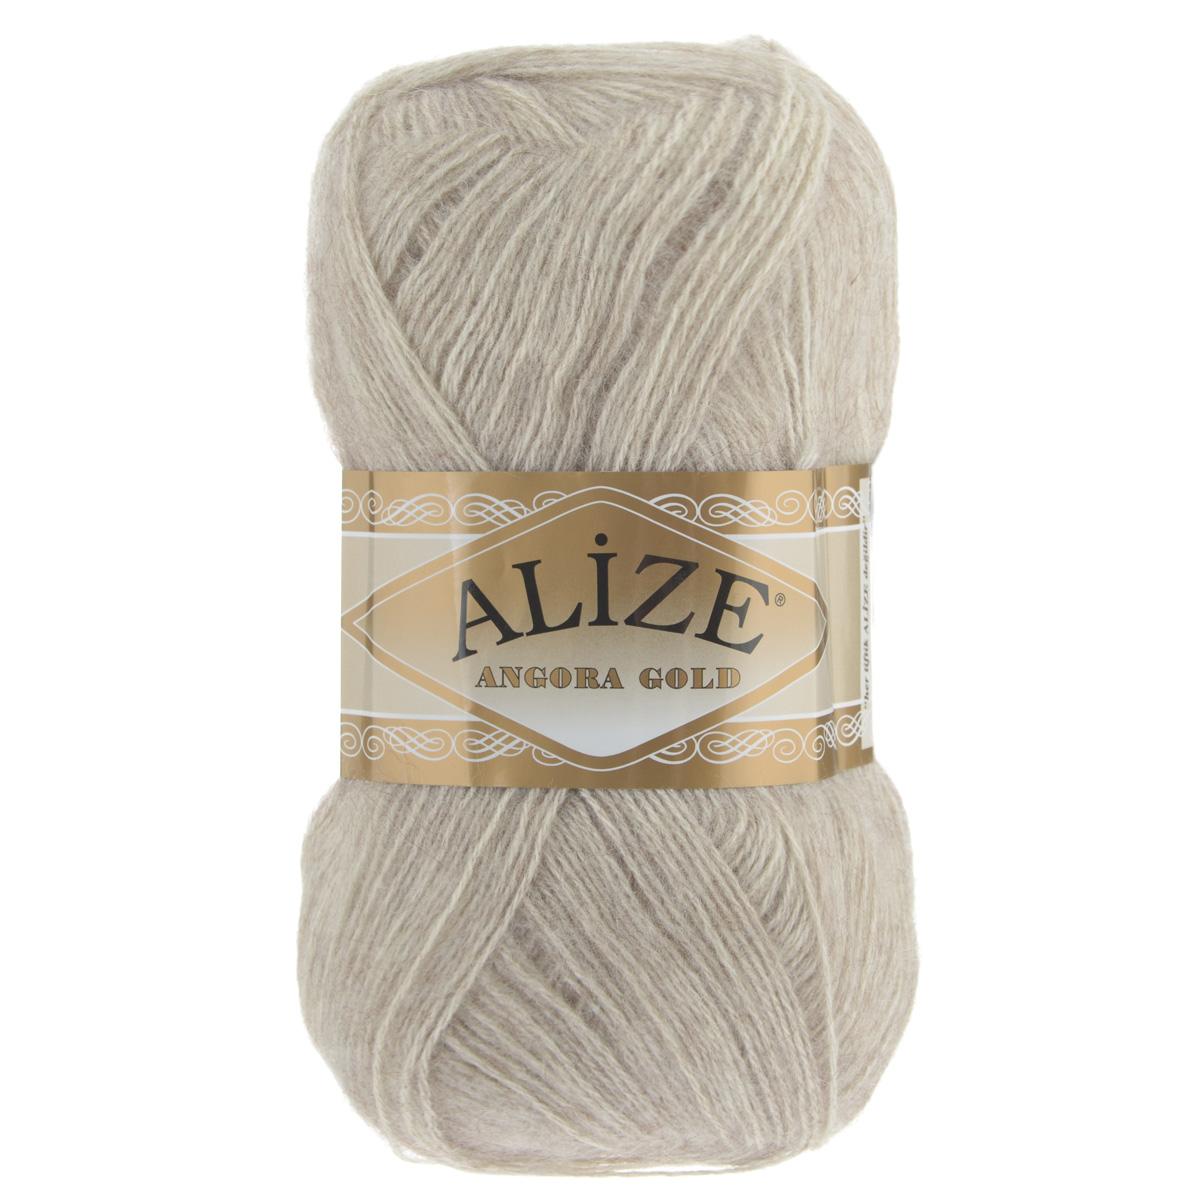 "Пряжа для вязания Alize ""Angora Gold"", цвет: бежевый меланж (152), 550 м, 100 г, 5 шт"